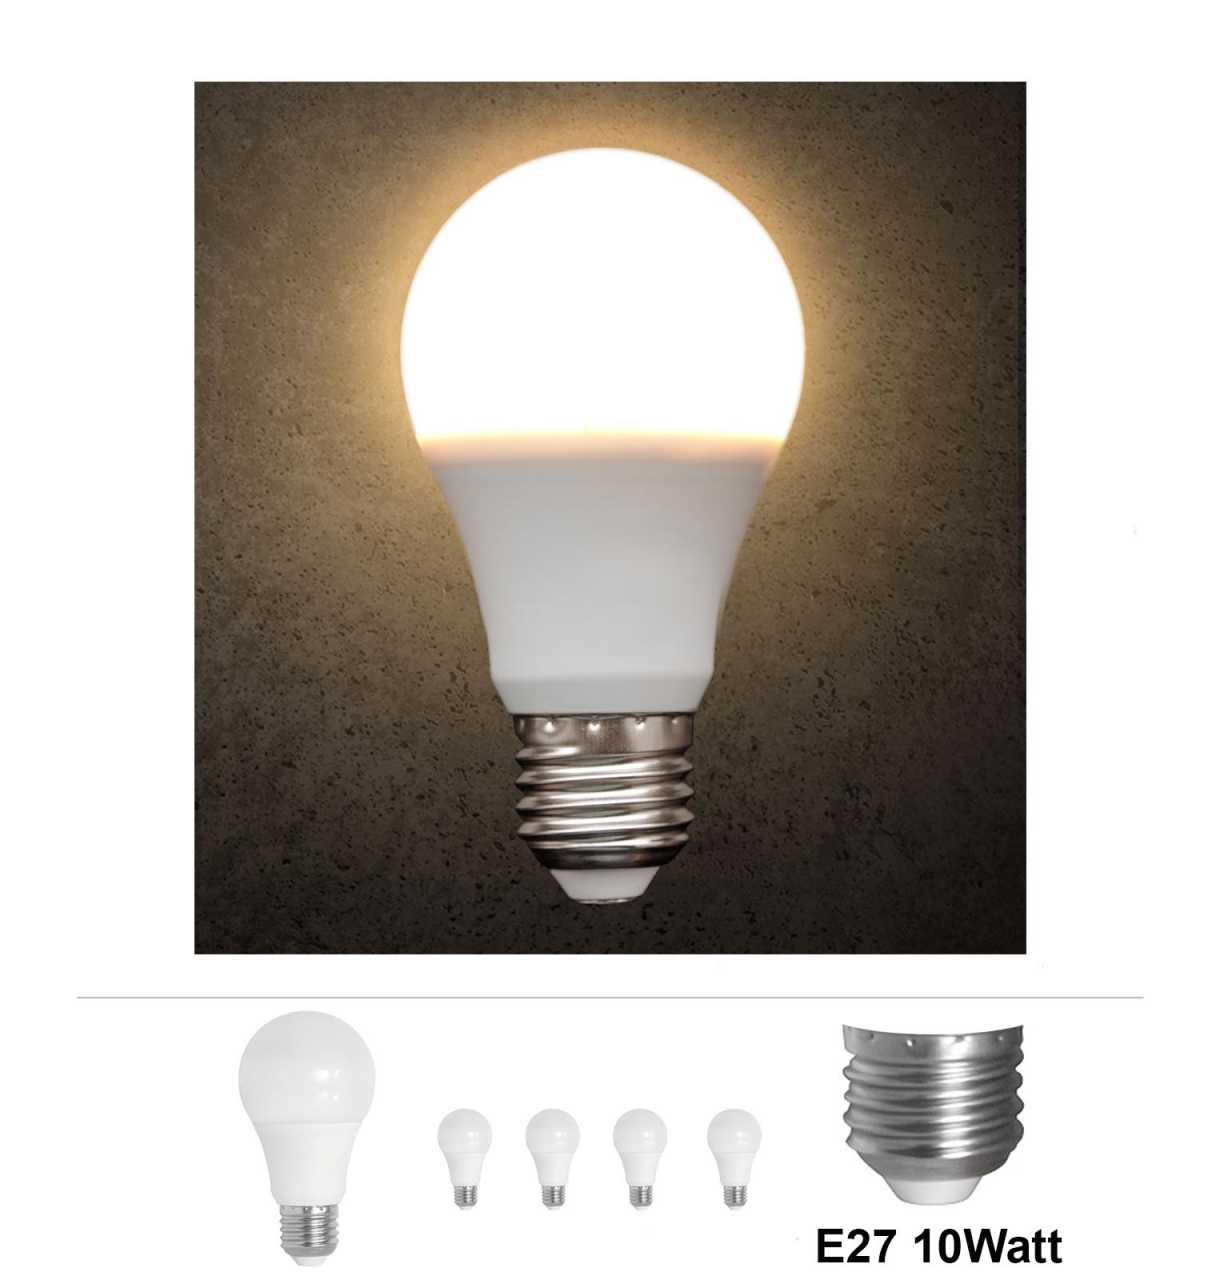 4x Grafner® LED Leuchtmittel E27 10 Watt 3000K Warmweiss